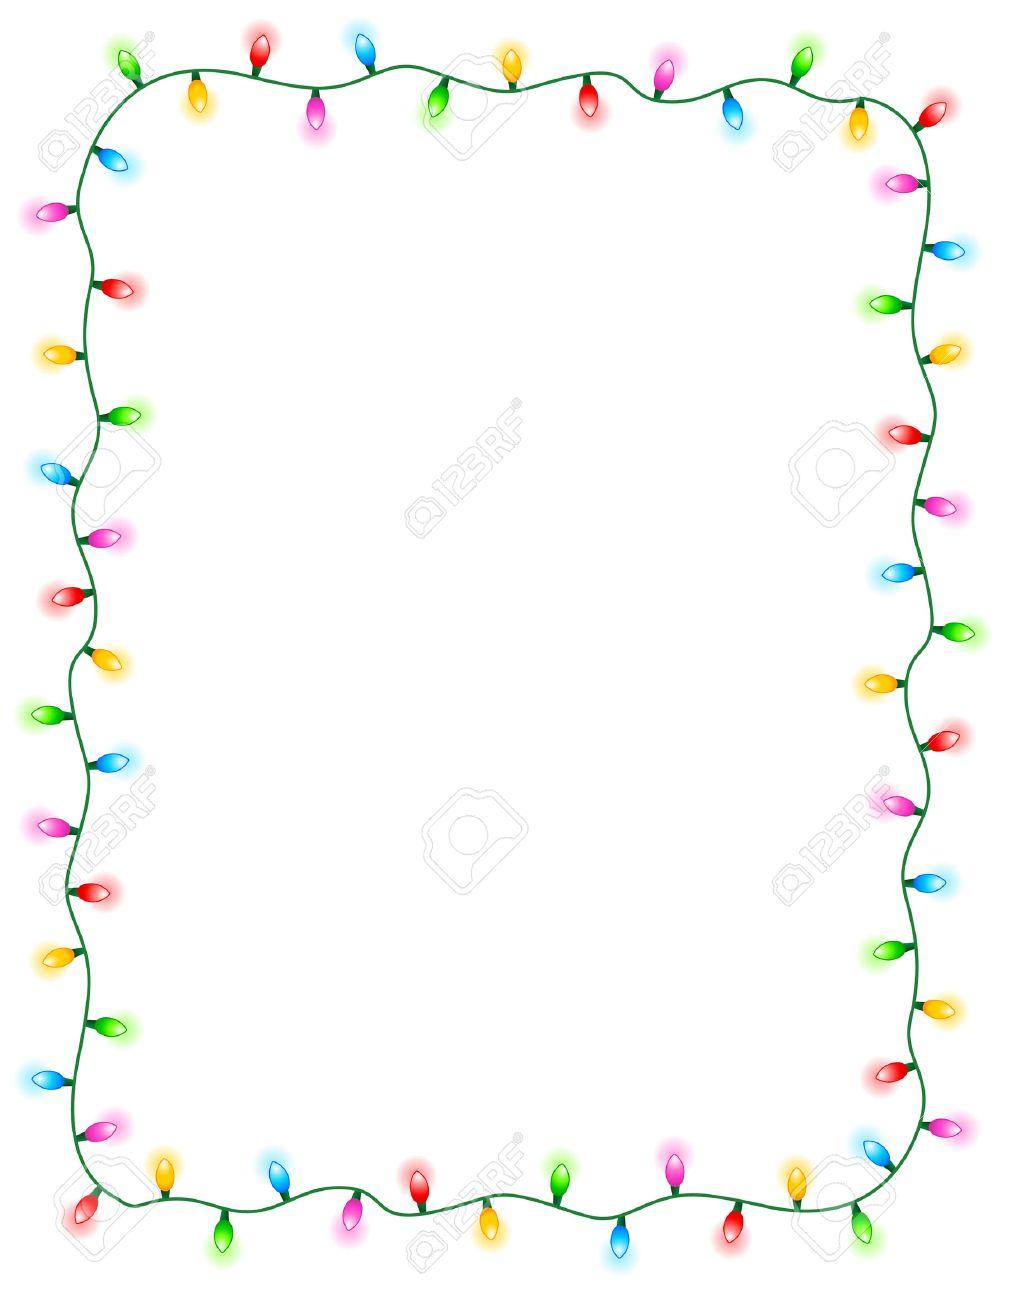 Navidad Colorida Brillante Ilumina Frontera / Marco. Colorido Luces ...